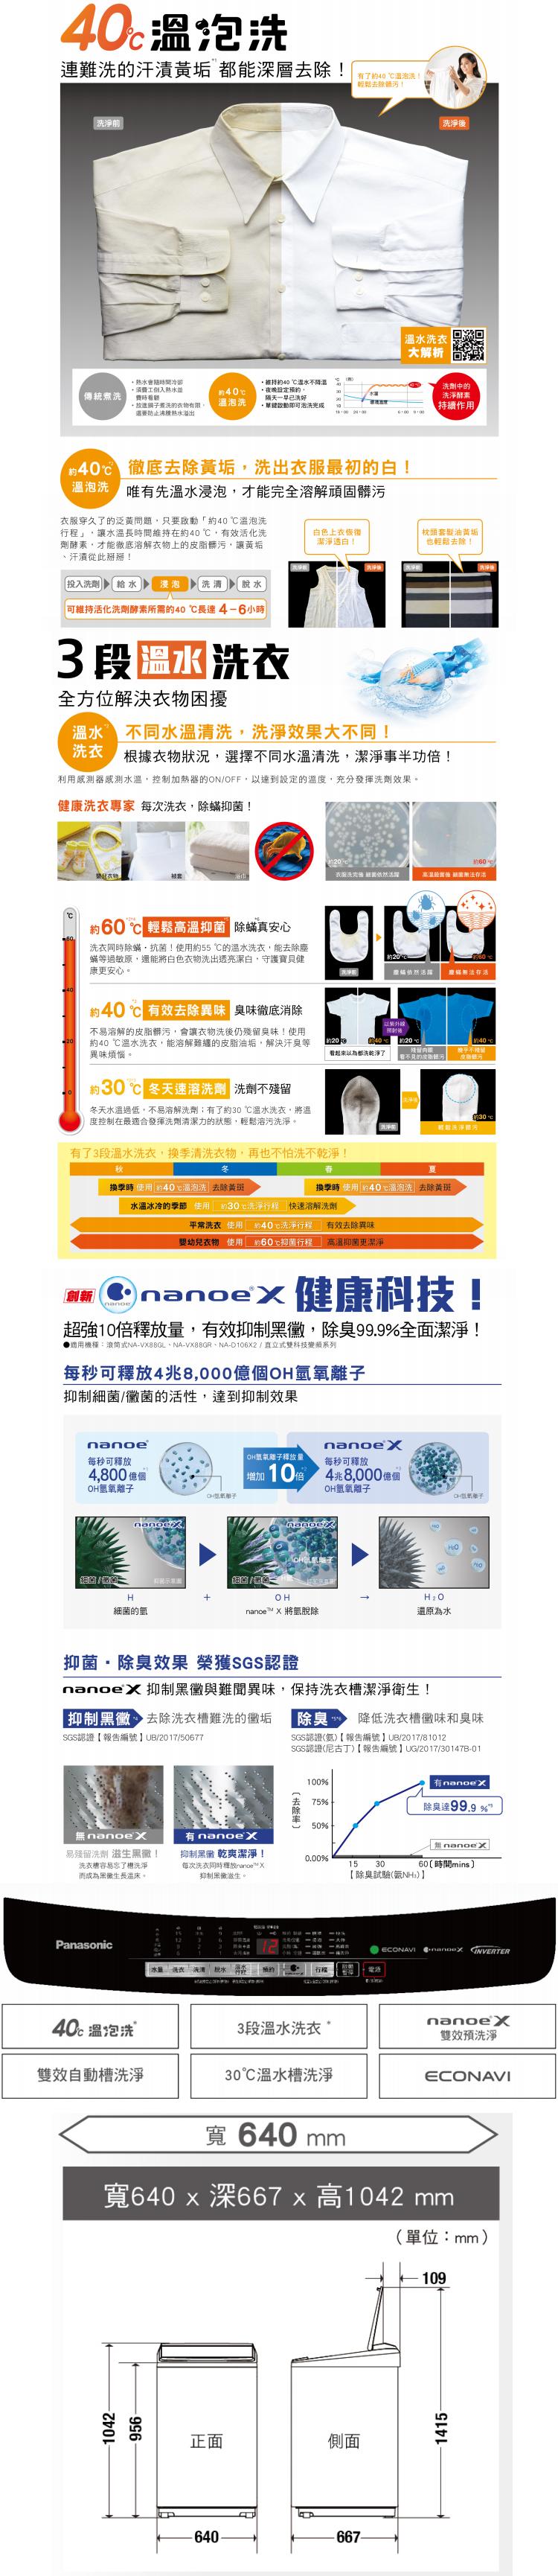 Panasonic國際牌 17公斤 ECONAVI 變頻直立式 溫水洗衣機 NA-V170GB-T